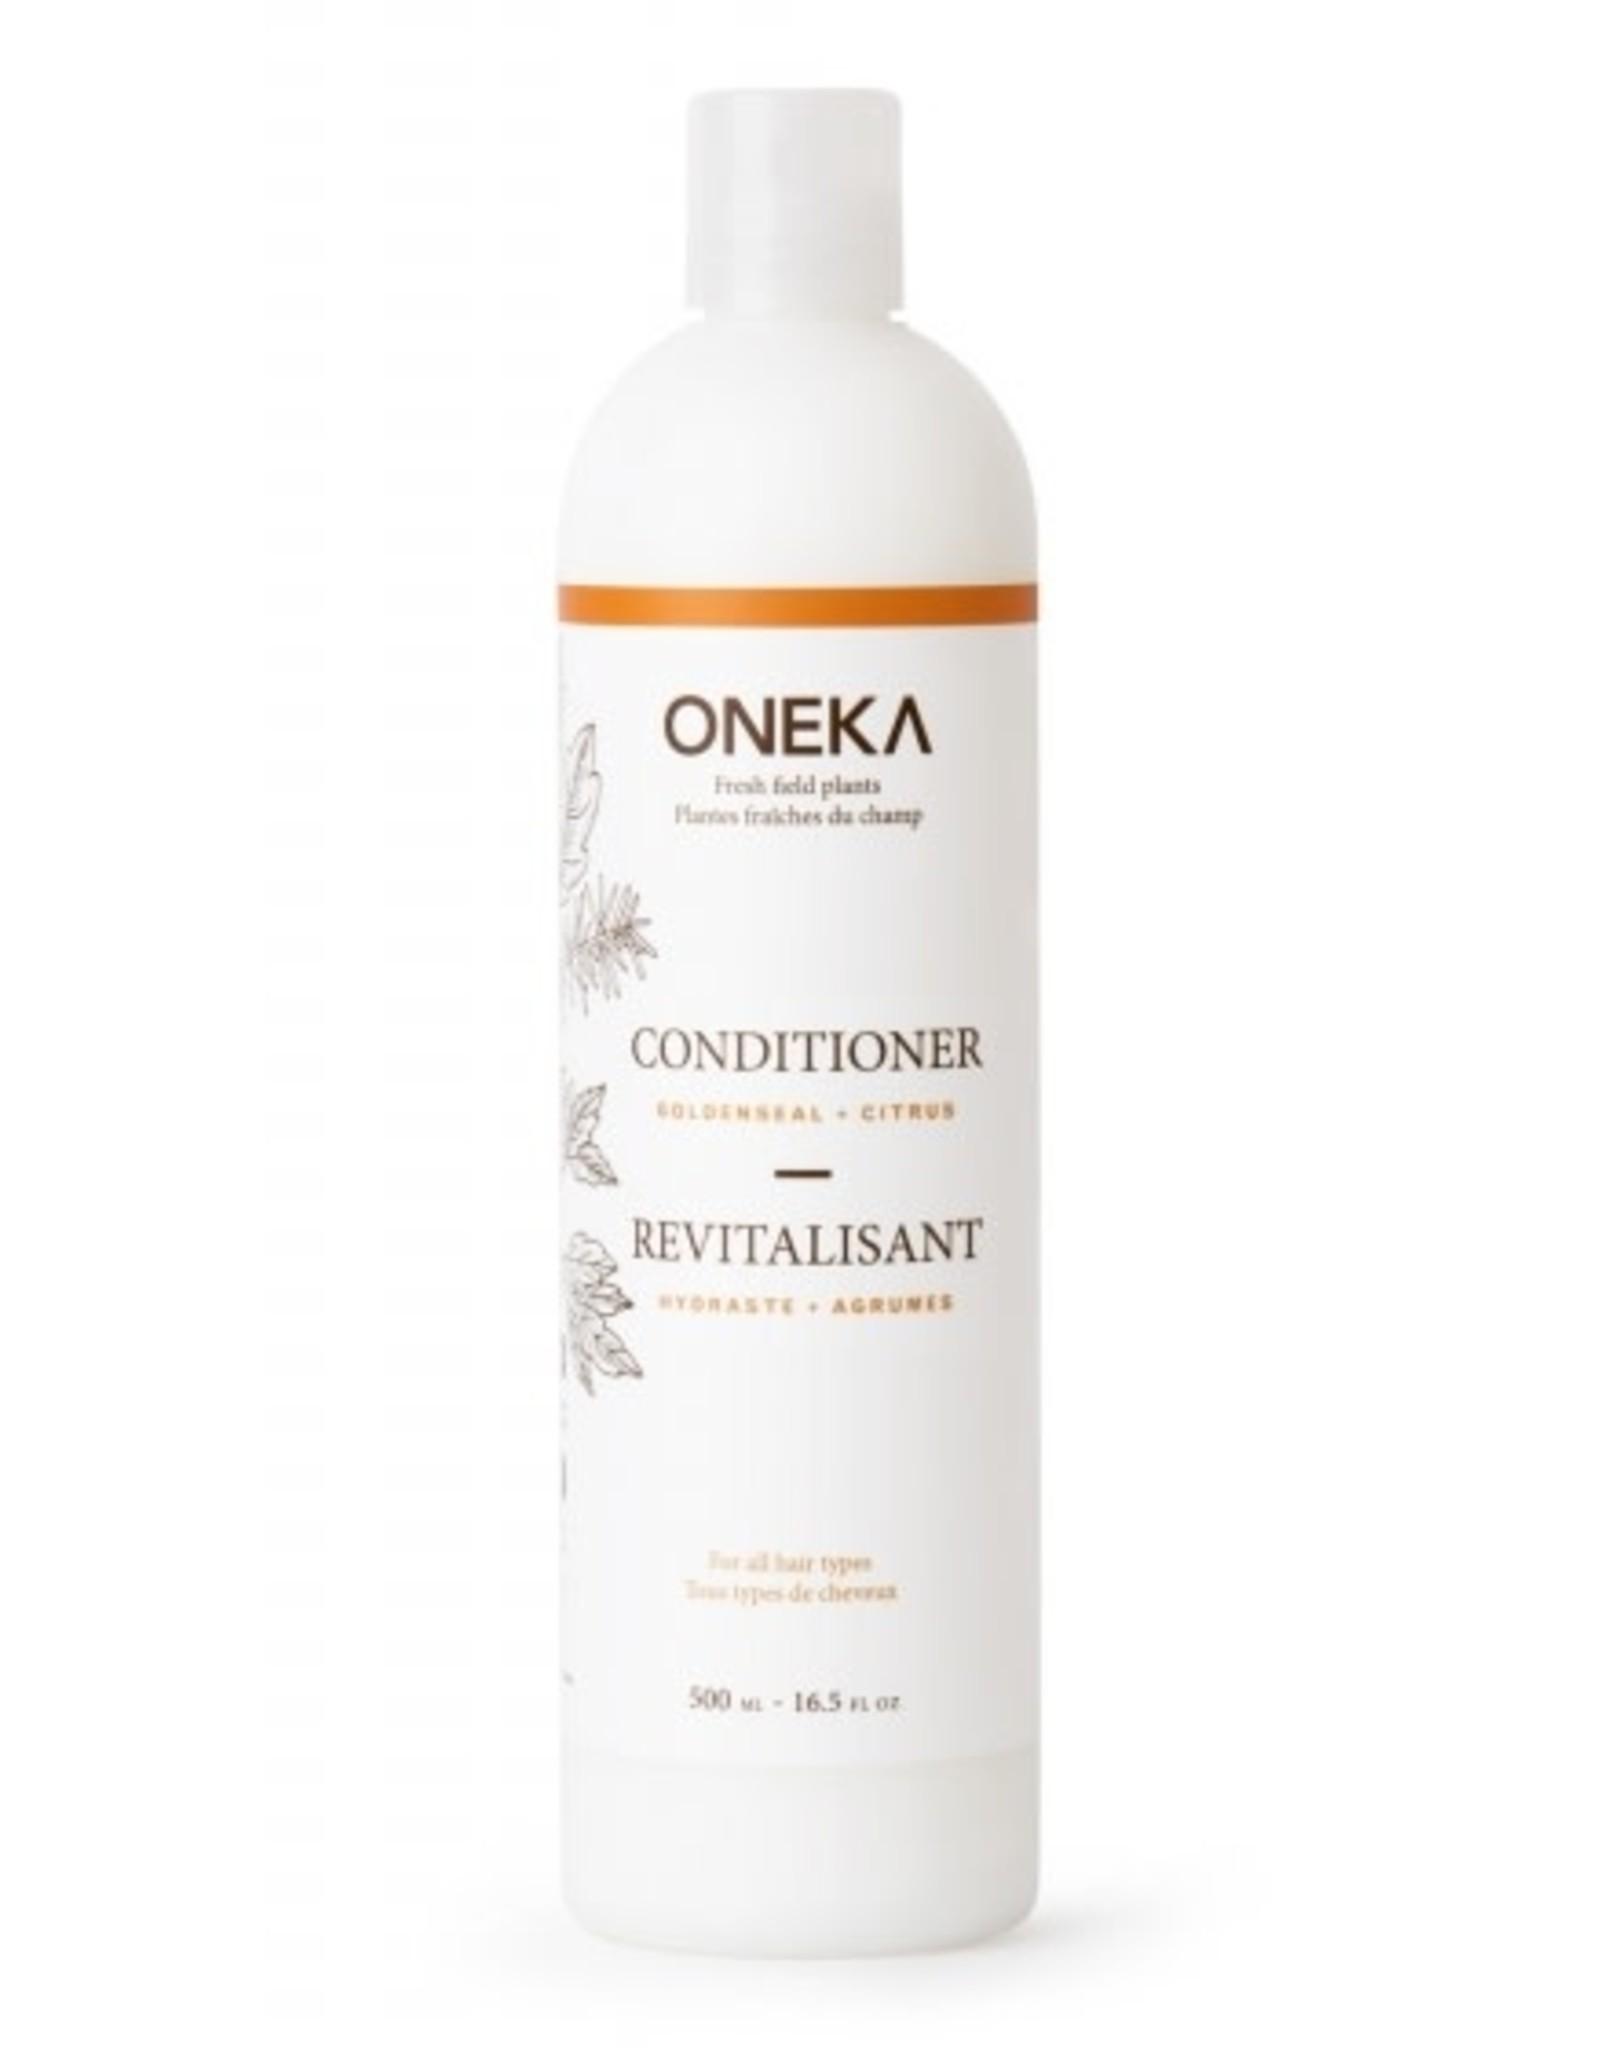 Oneka Goldenseal & Citrus Conditioner